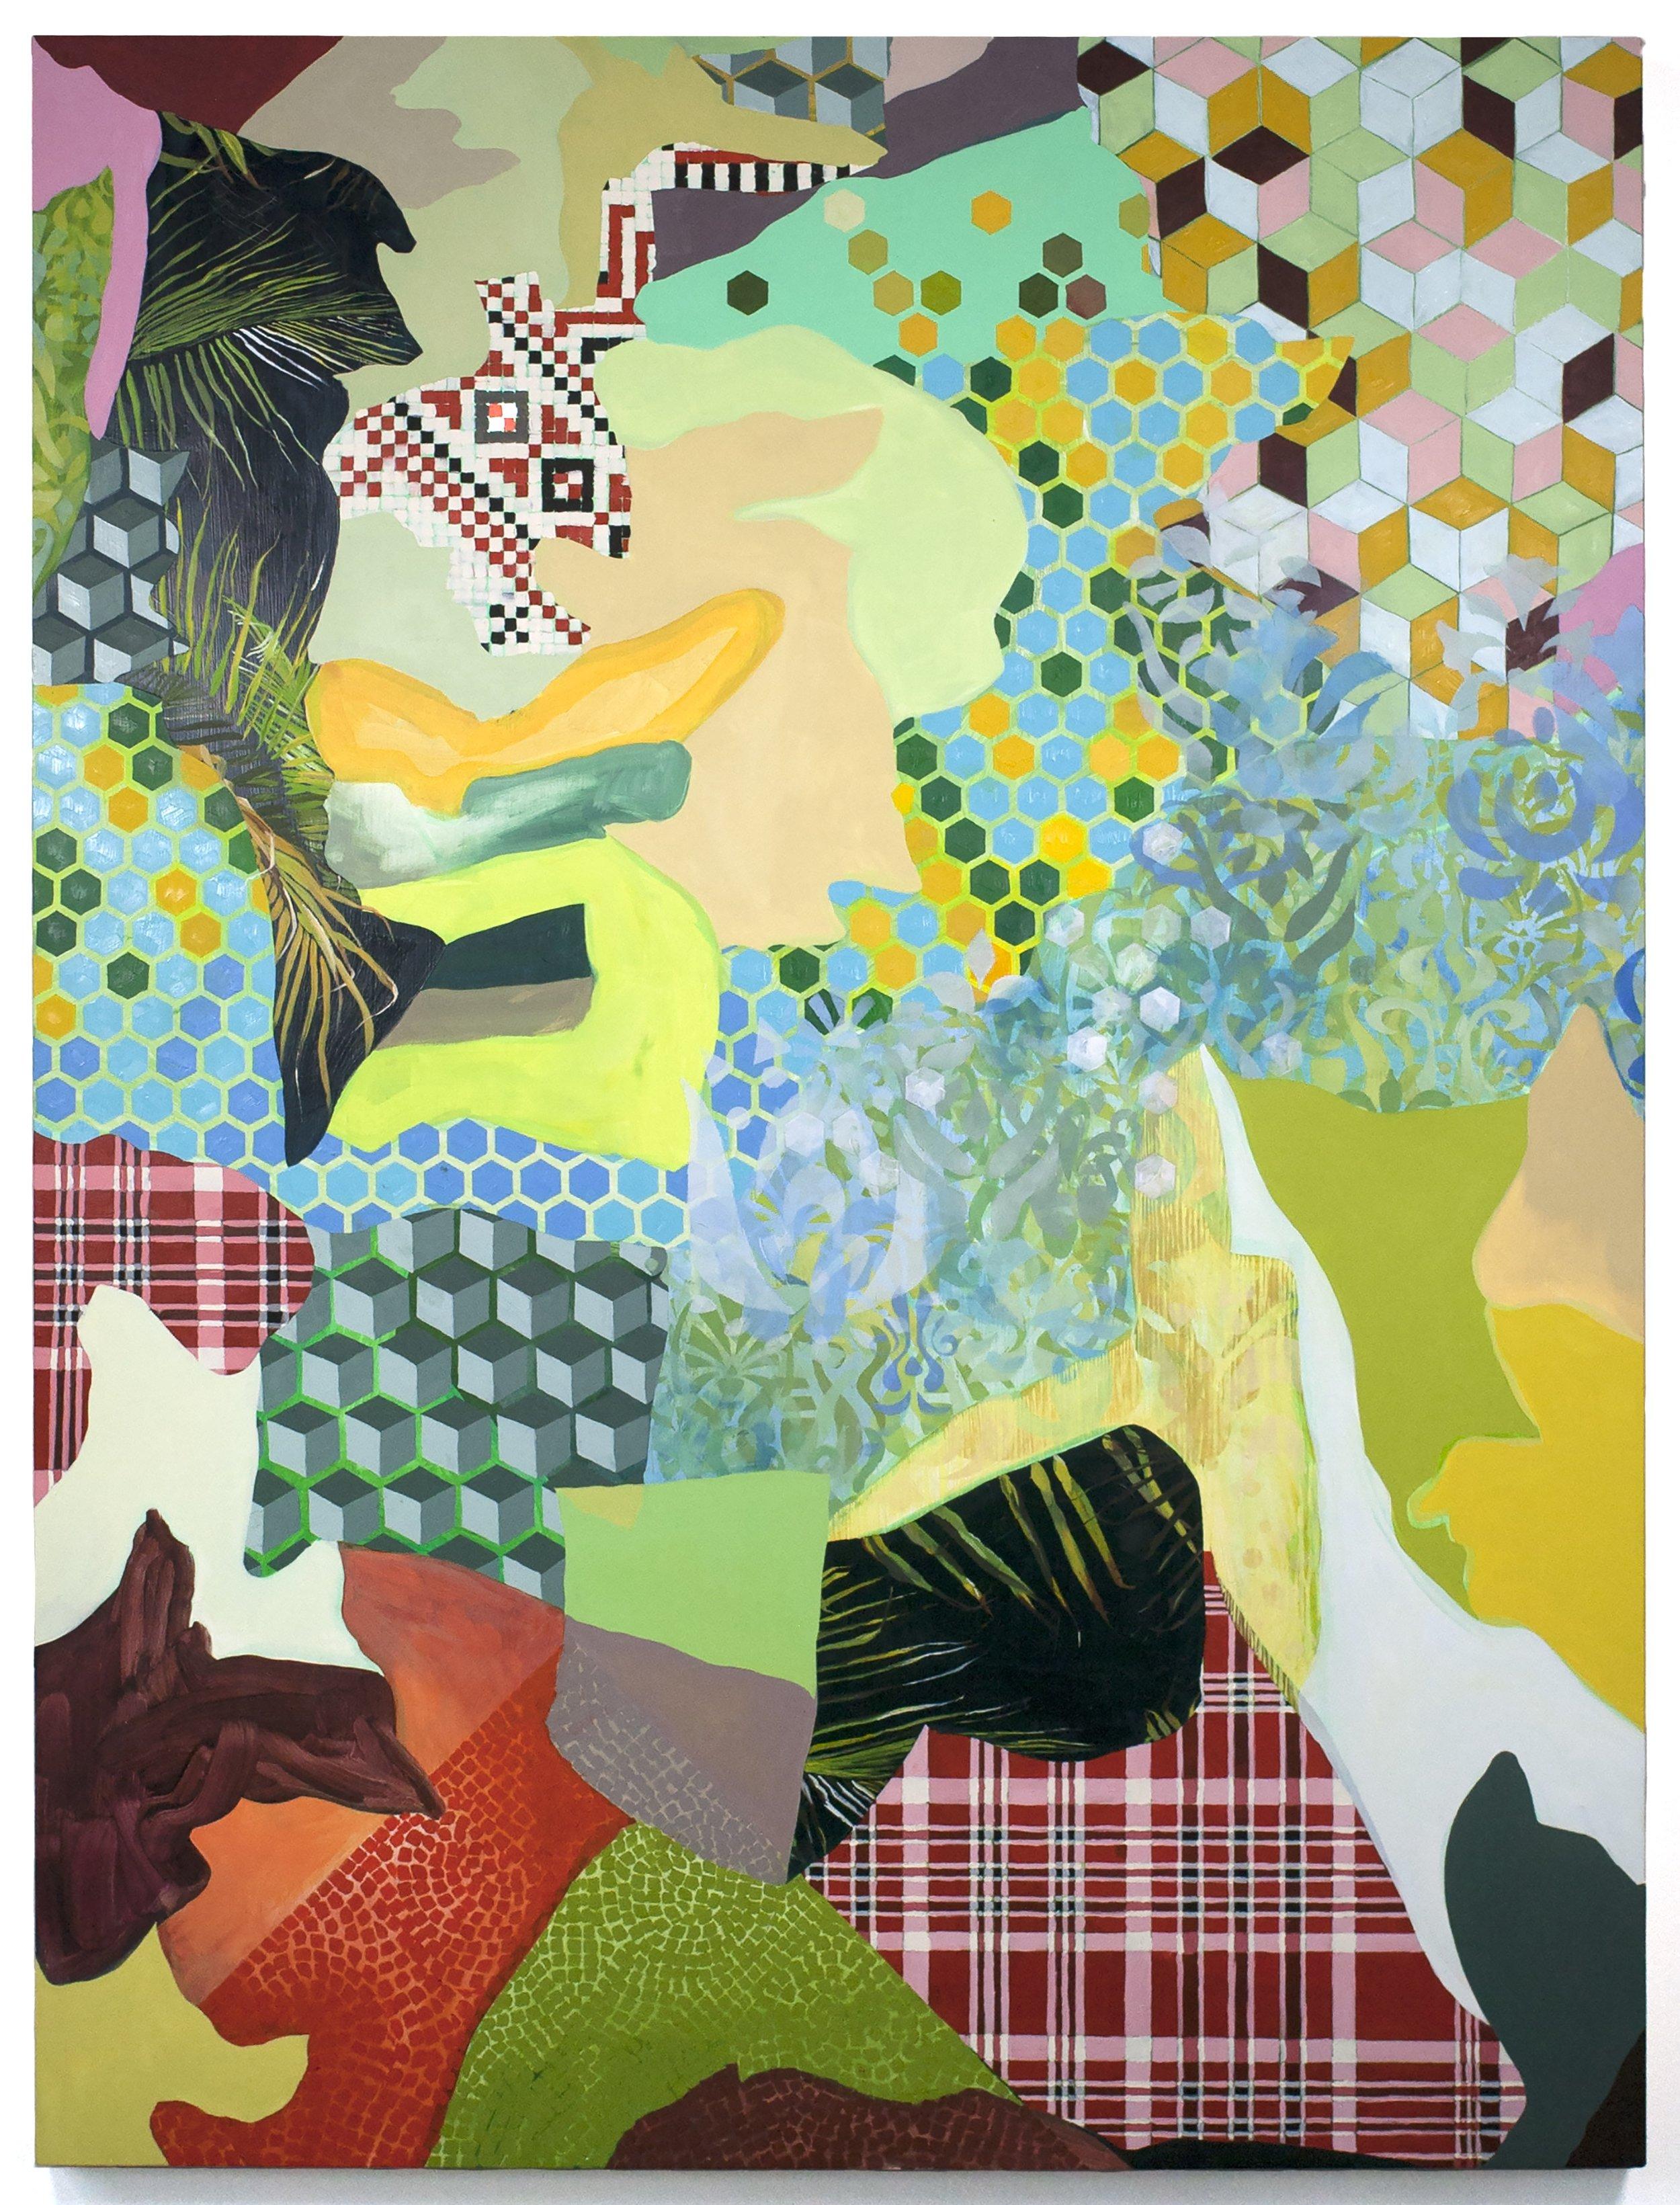 Luca Molnar,  Vesuvius at home  .  Oil on panel. 40 x 30 in.